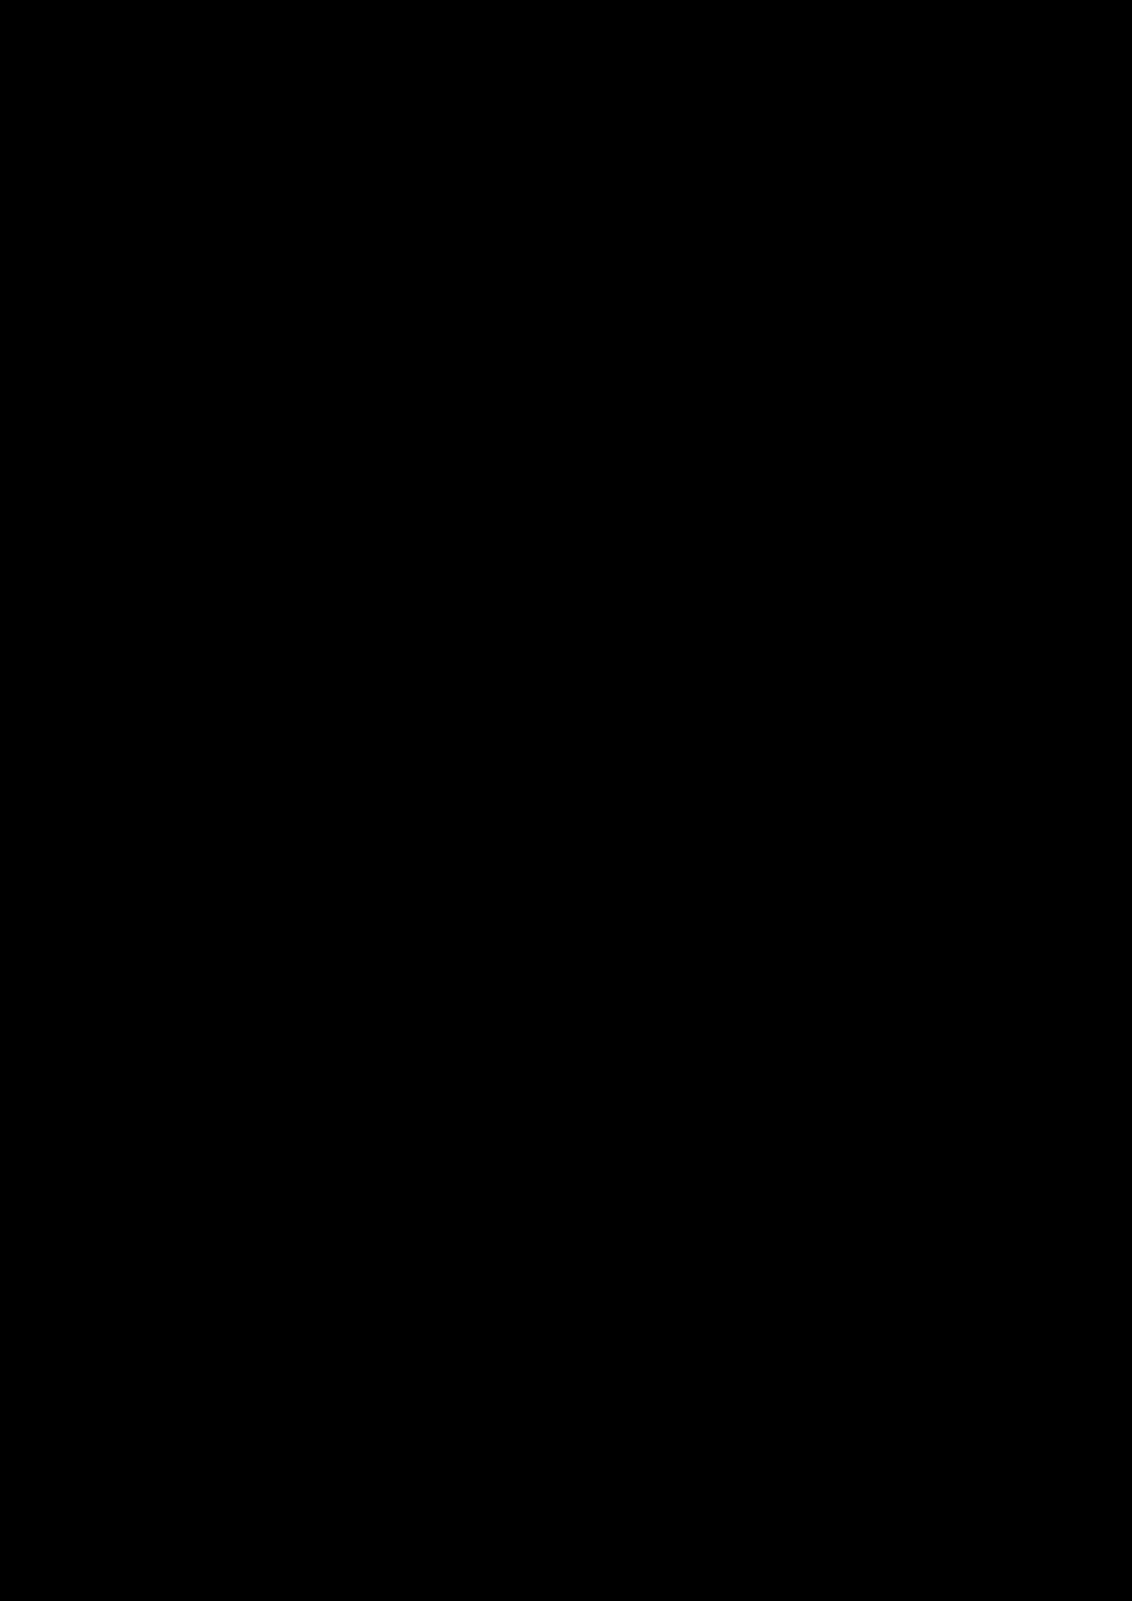 Belyiy sokol slide, Image 156